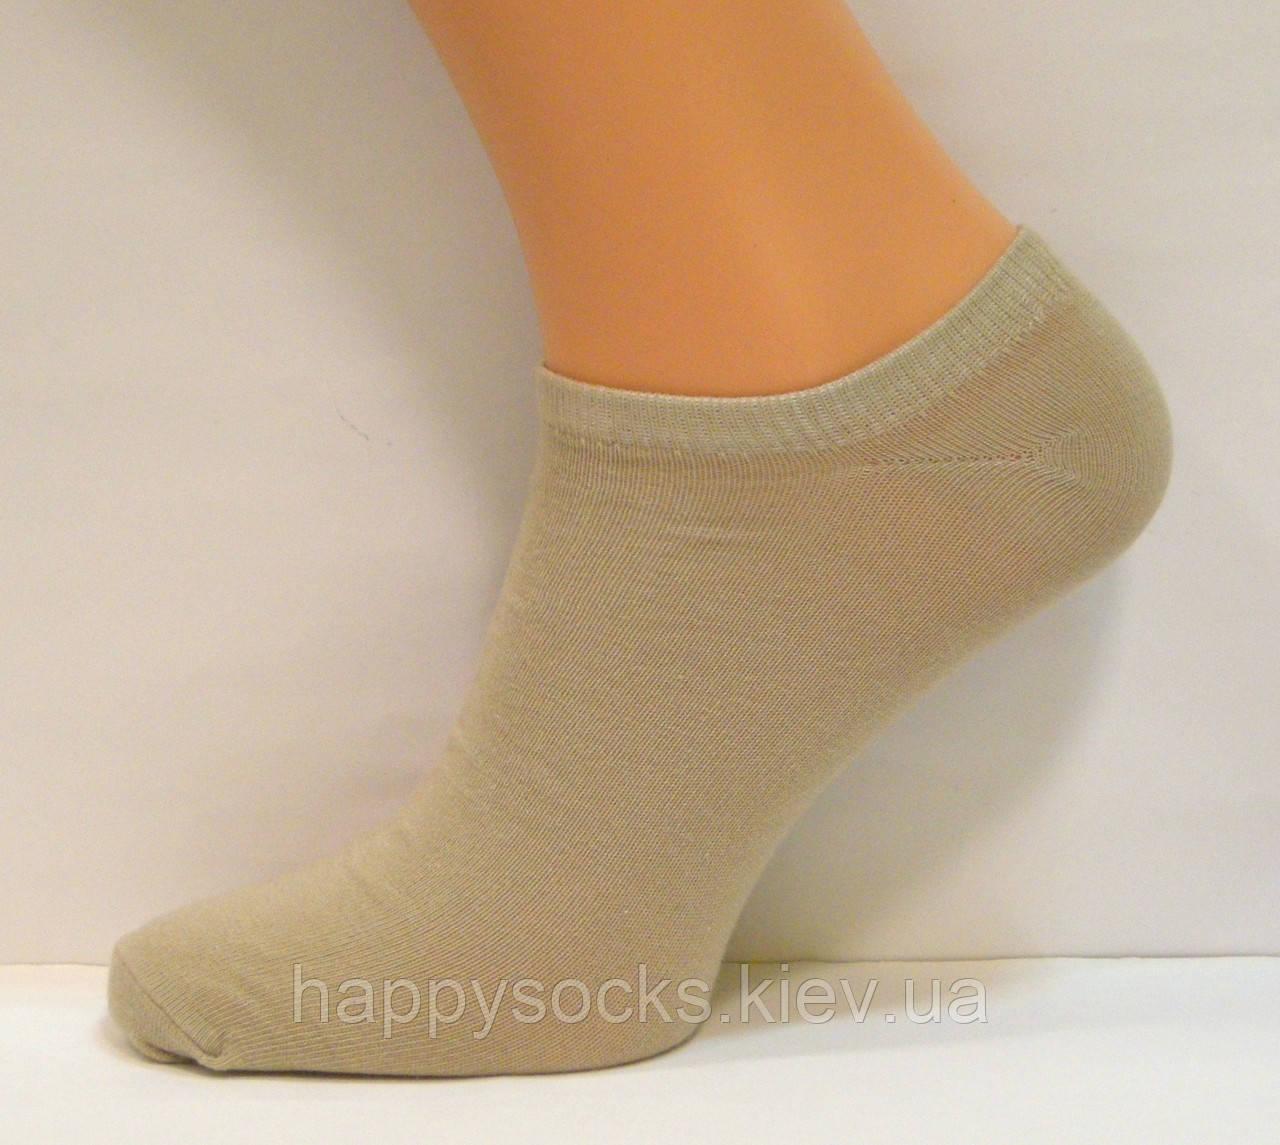 Носки мужские короткие бежевого цвета